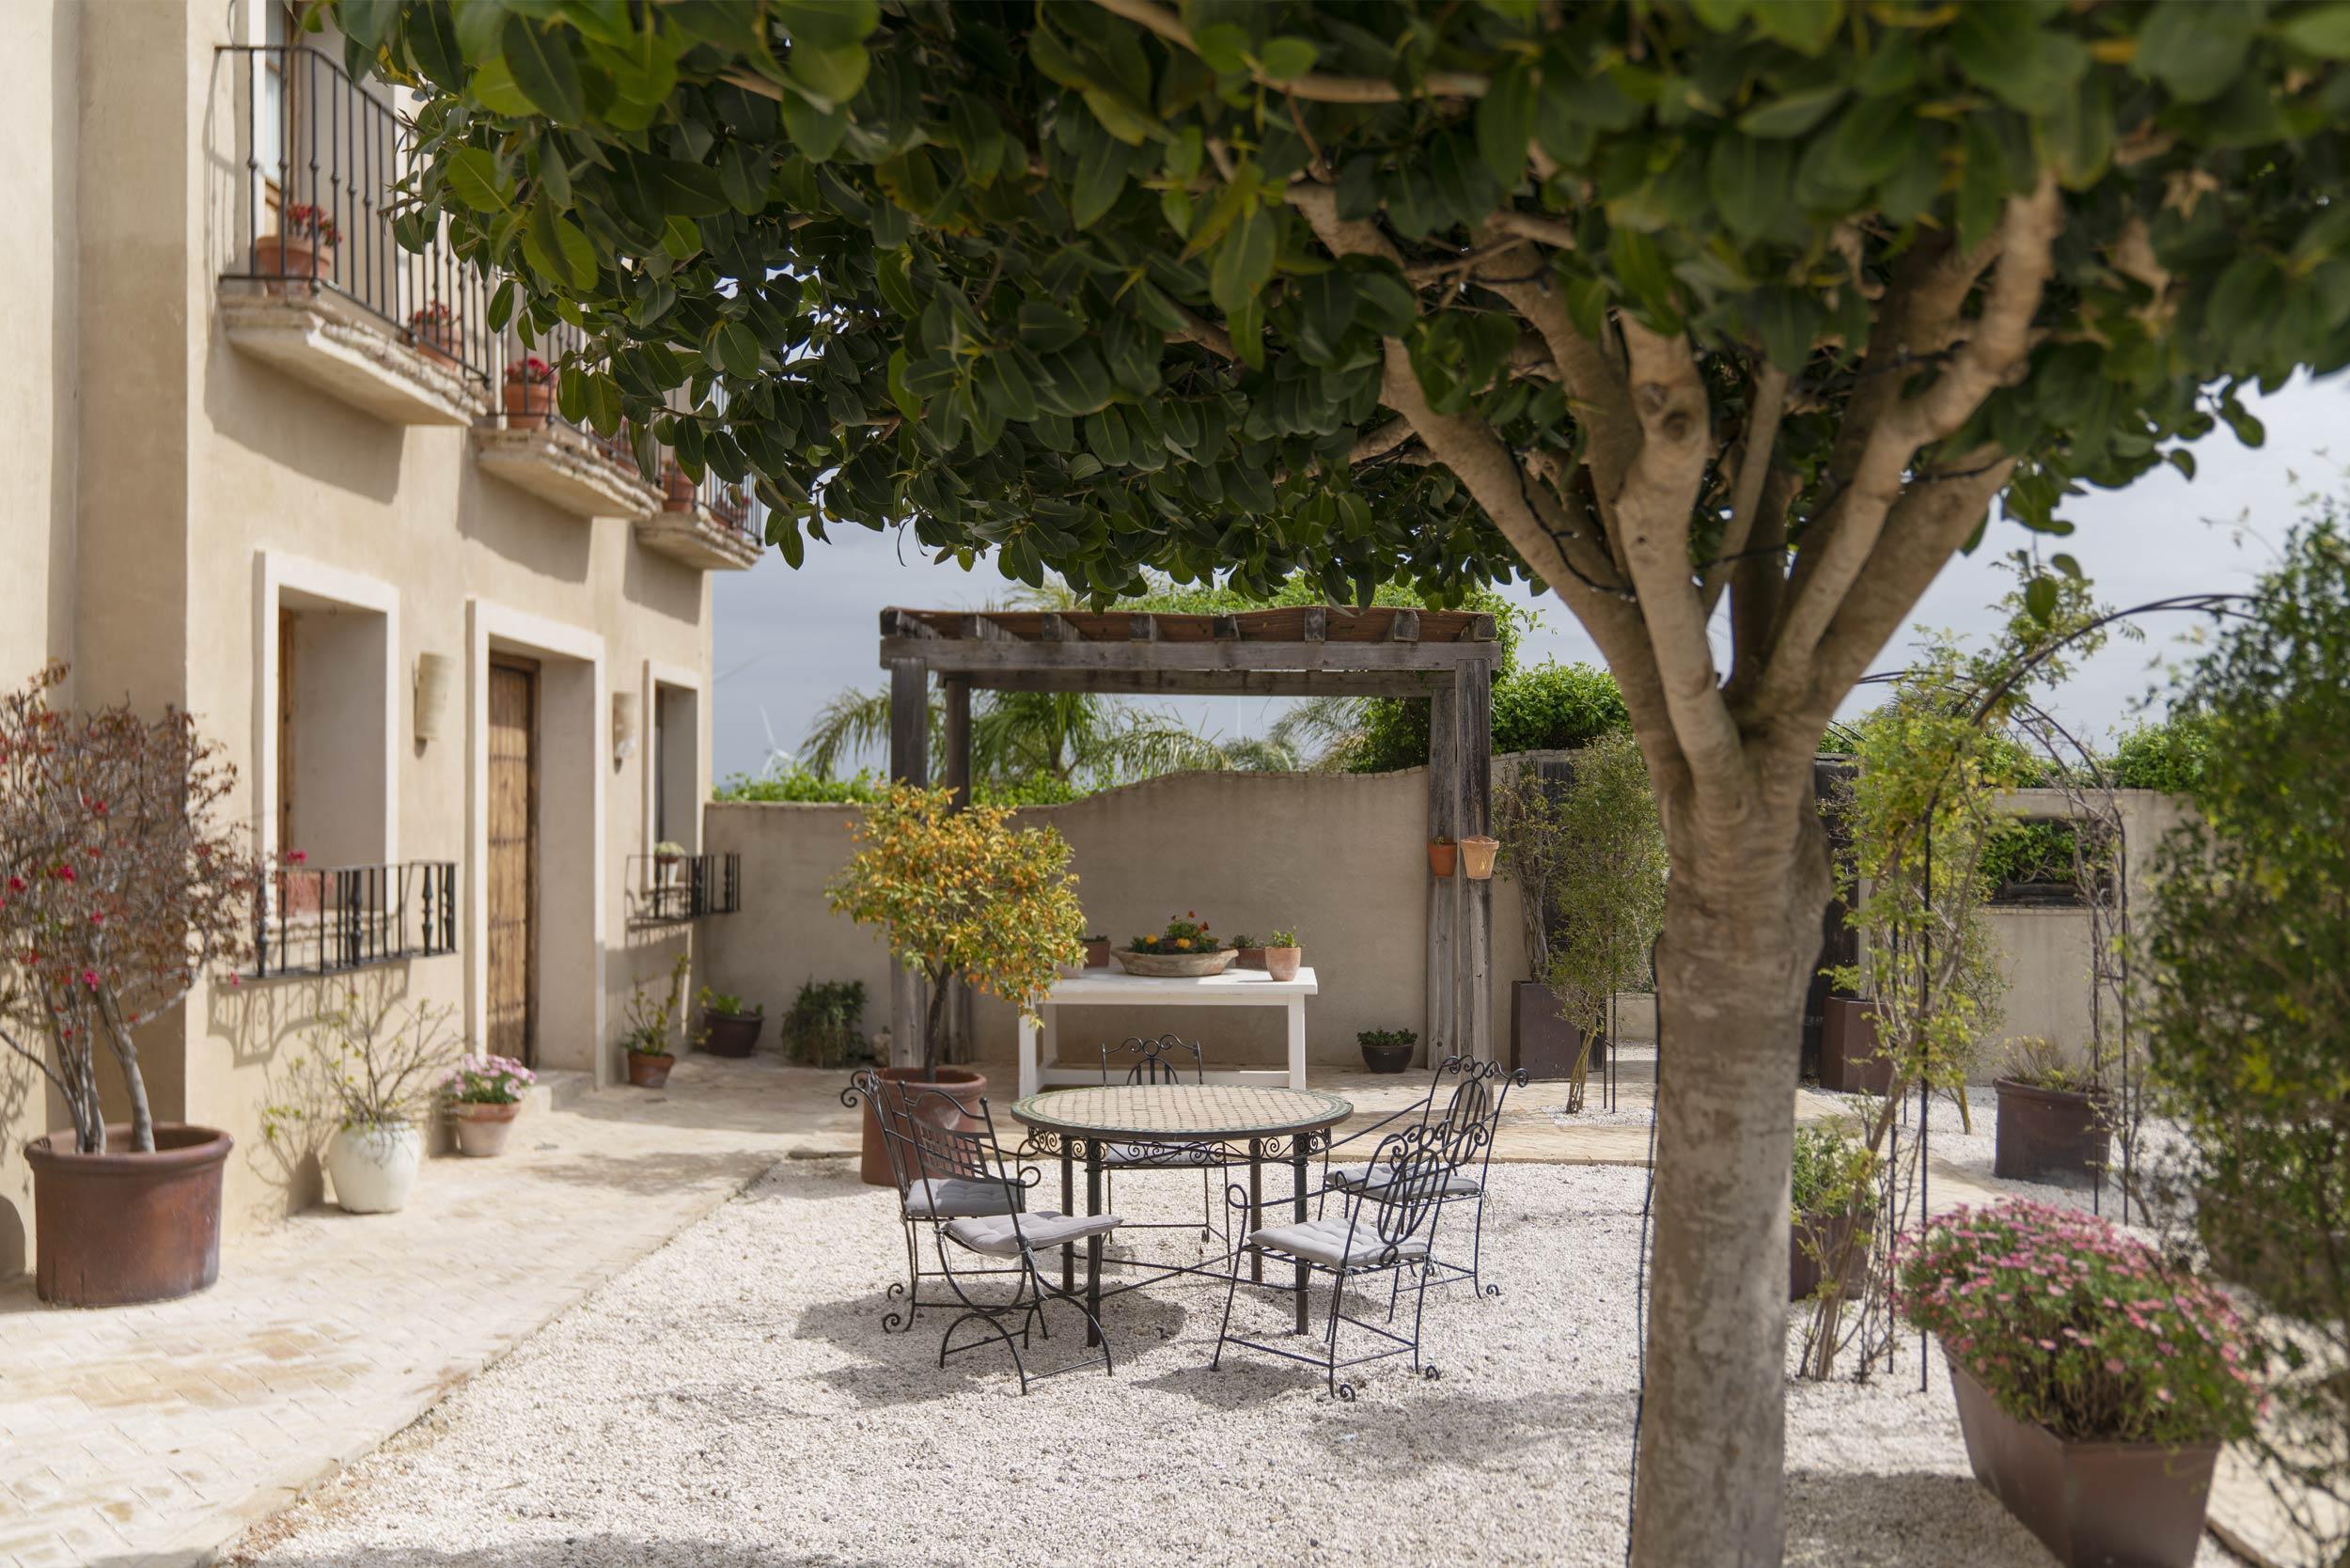 Casa-La-Siesta-Spain-Fiona-Burrage-Photography-courtyard.jpeg